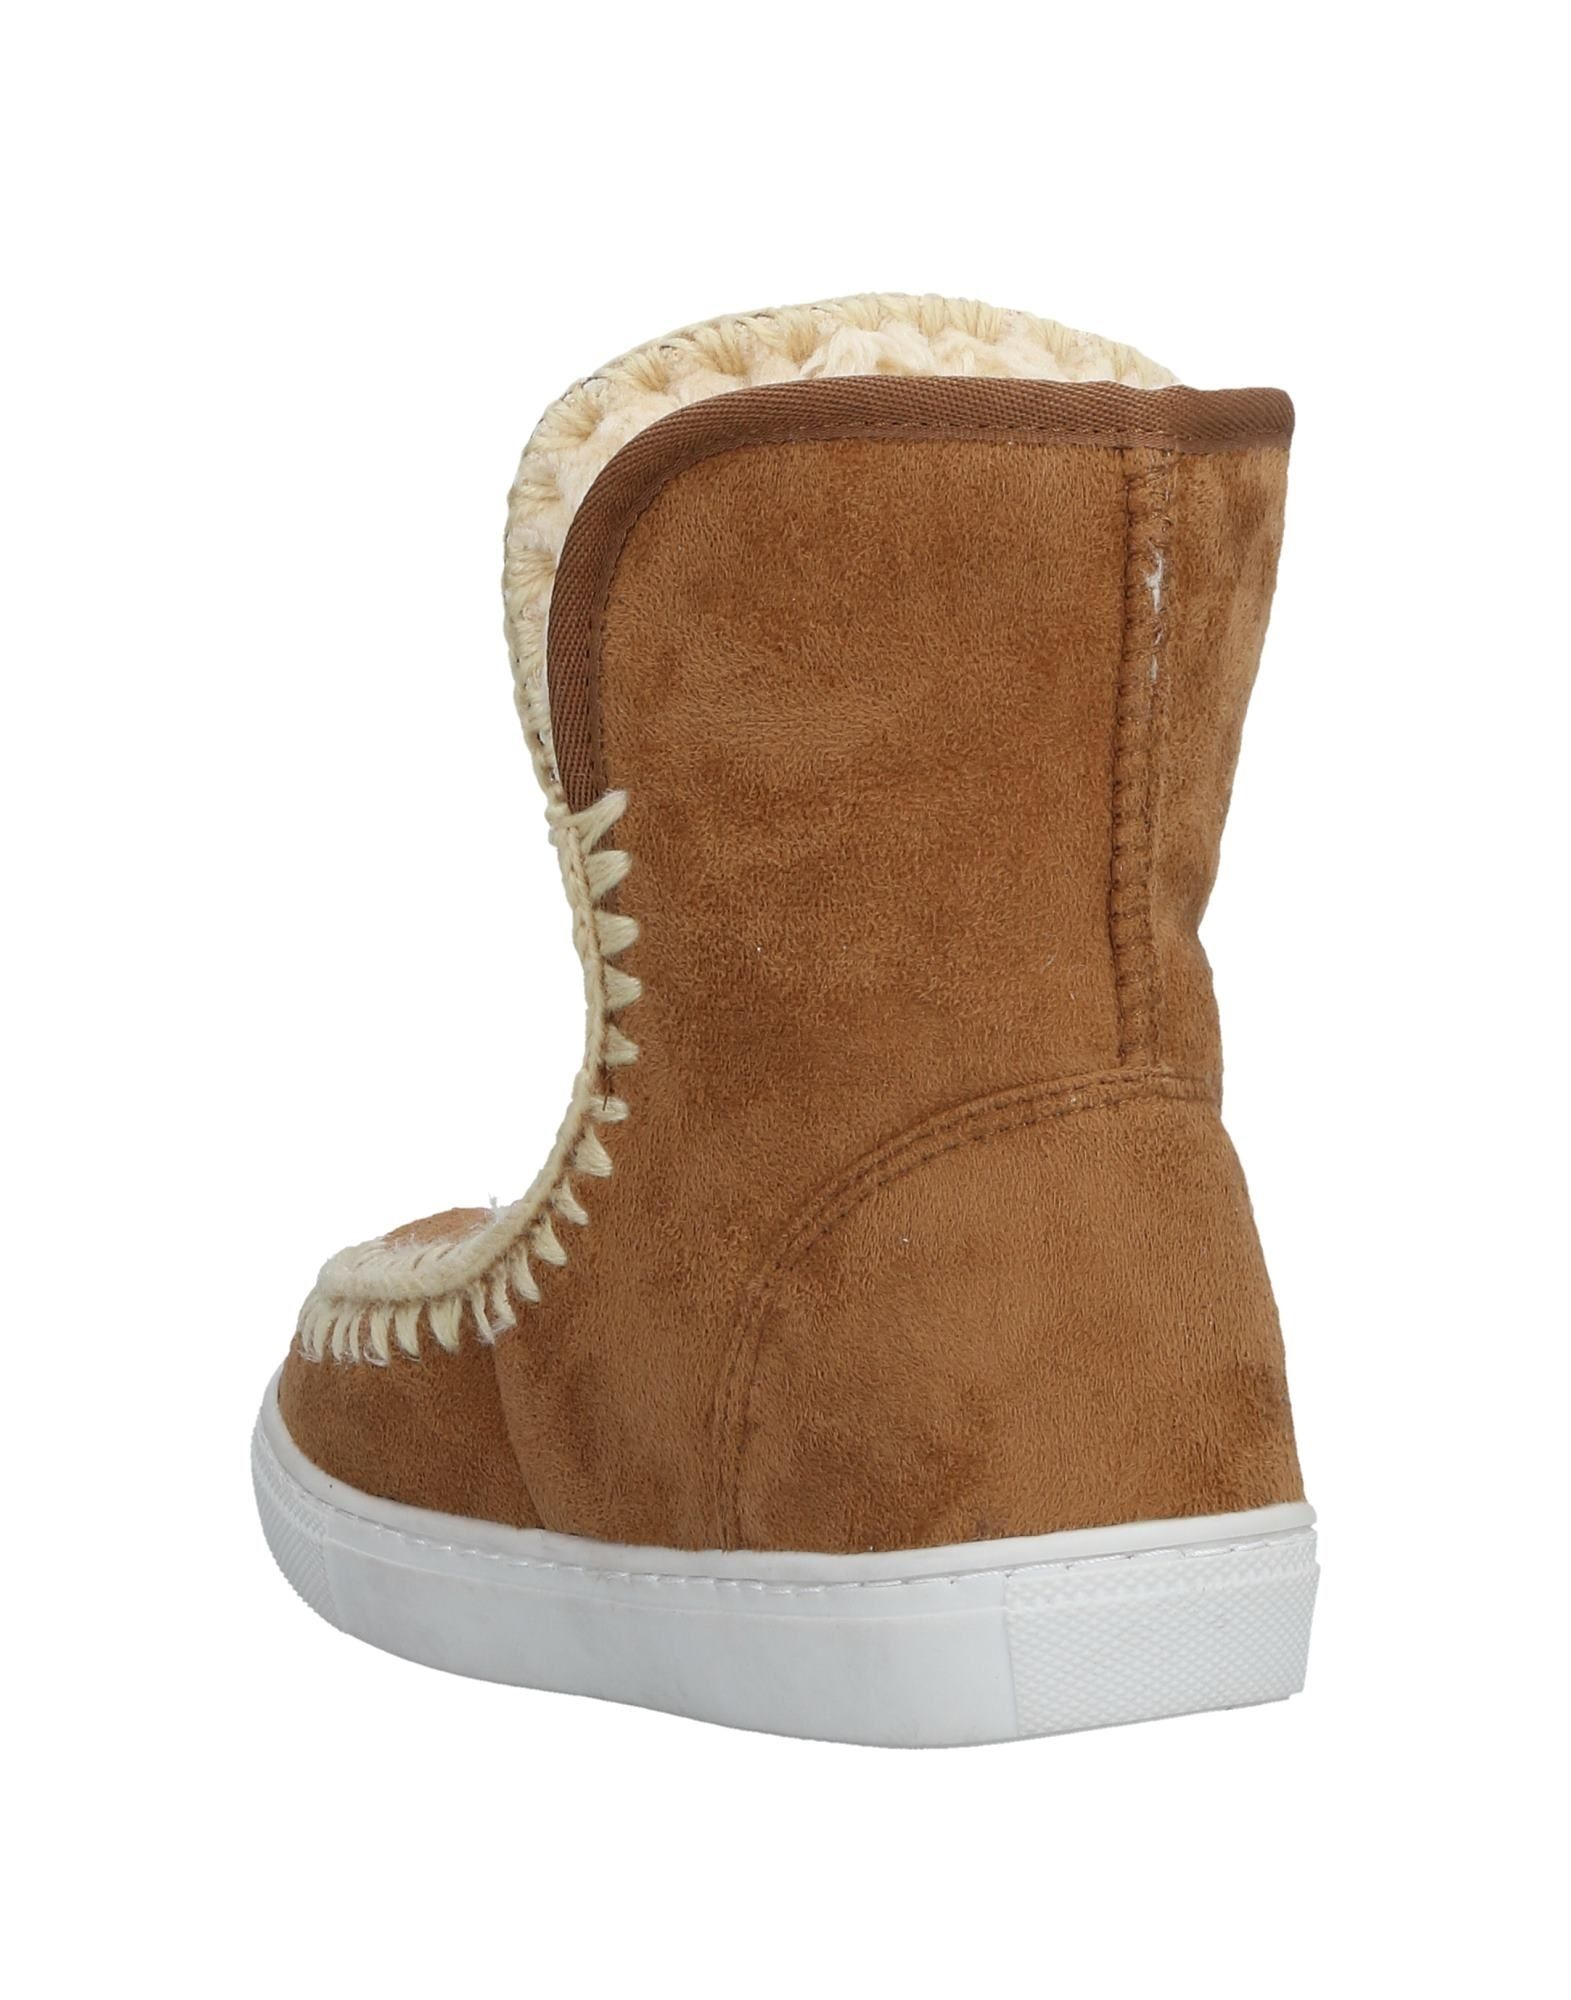 Roberto 11531251KN Della Croce Stiefelette Damen  11531251KN Roberto Gute Qualität beliebte Schuhe 103a9b